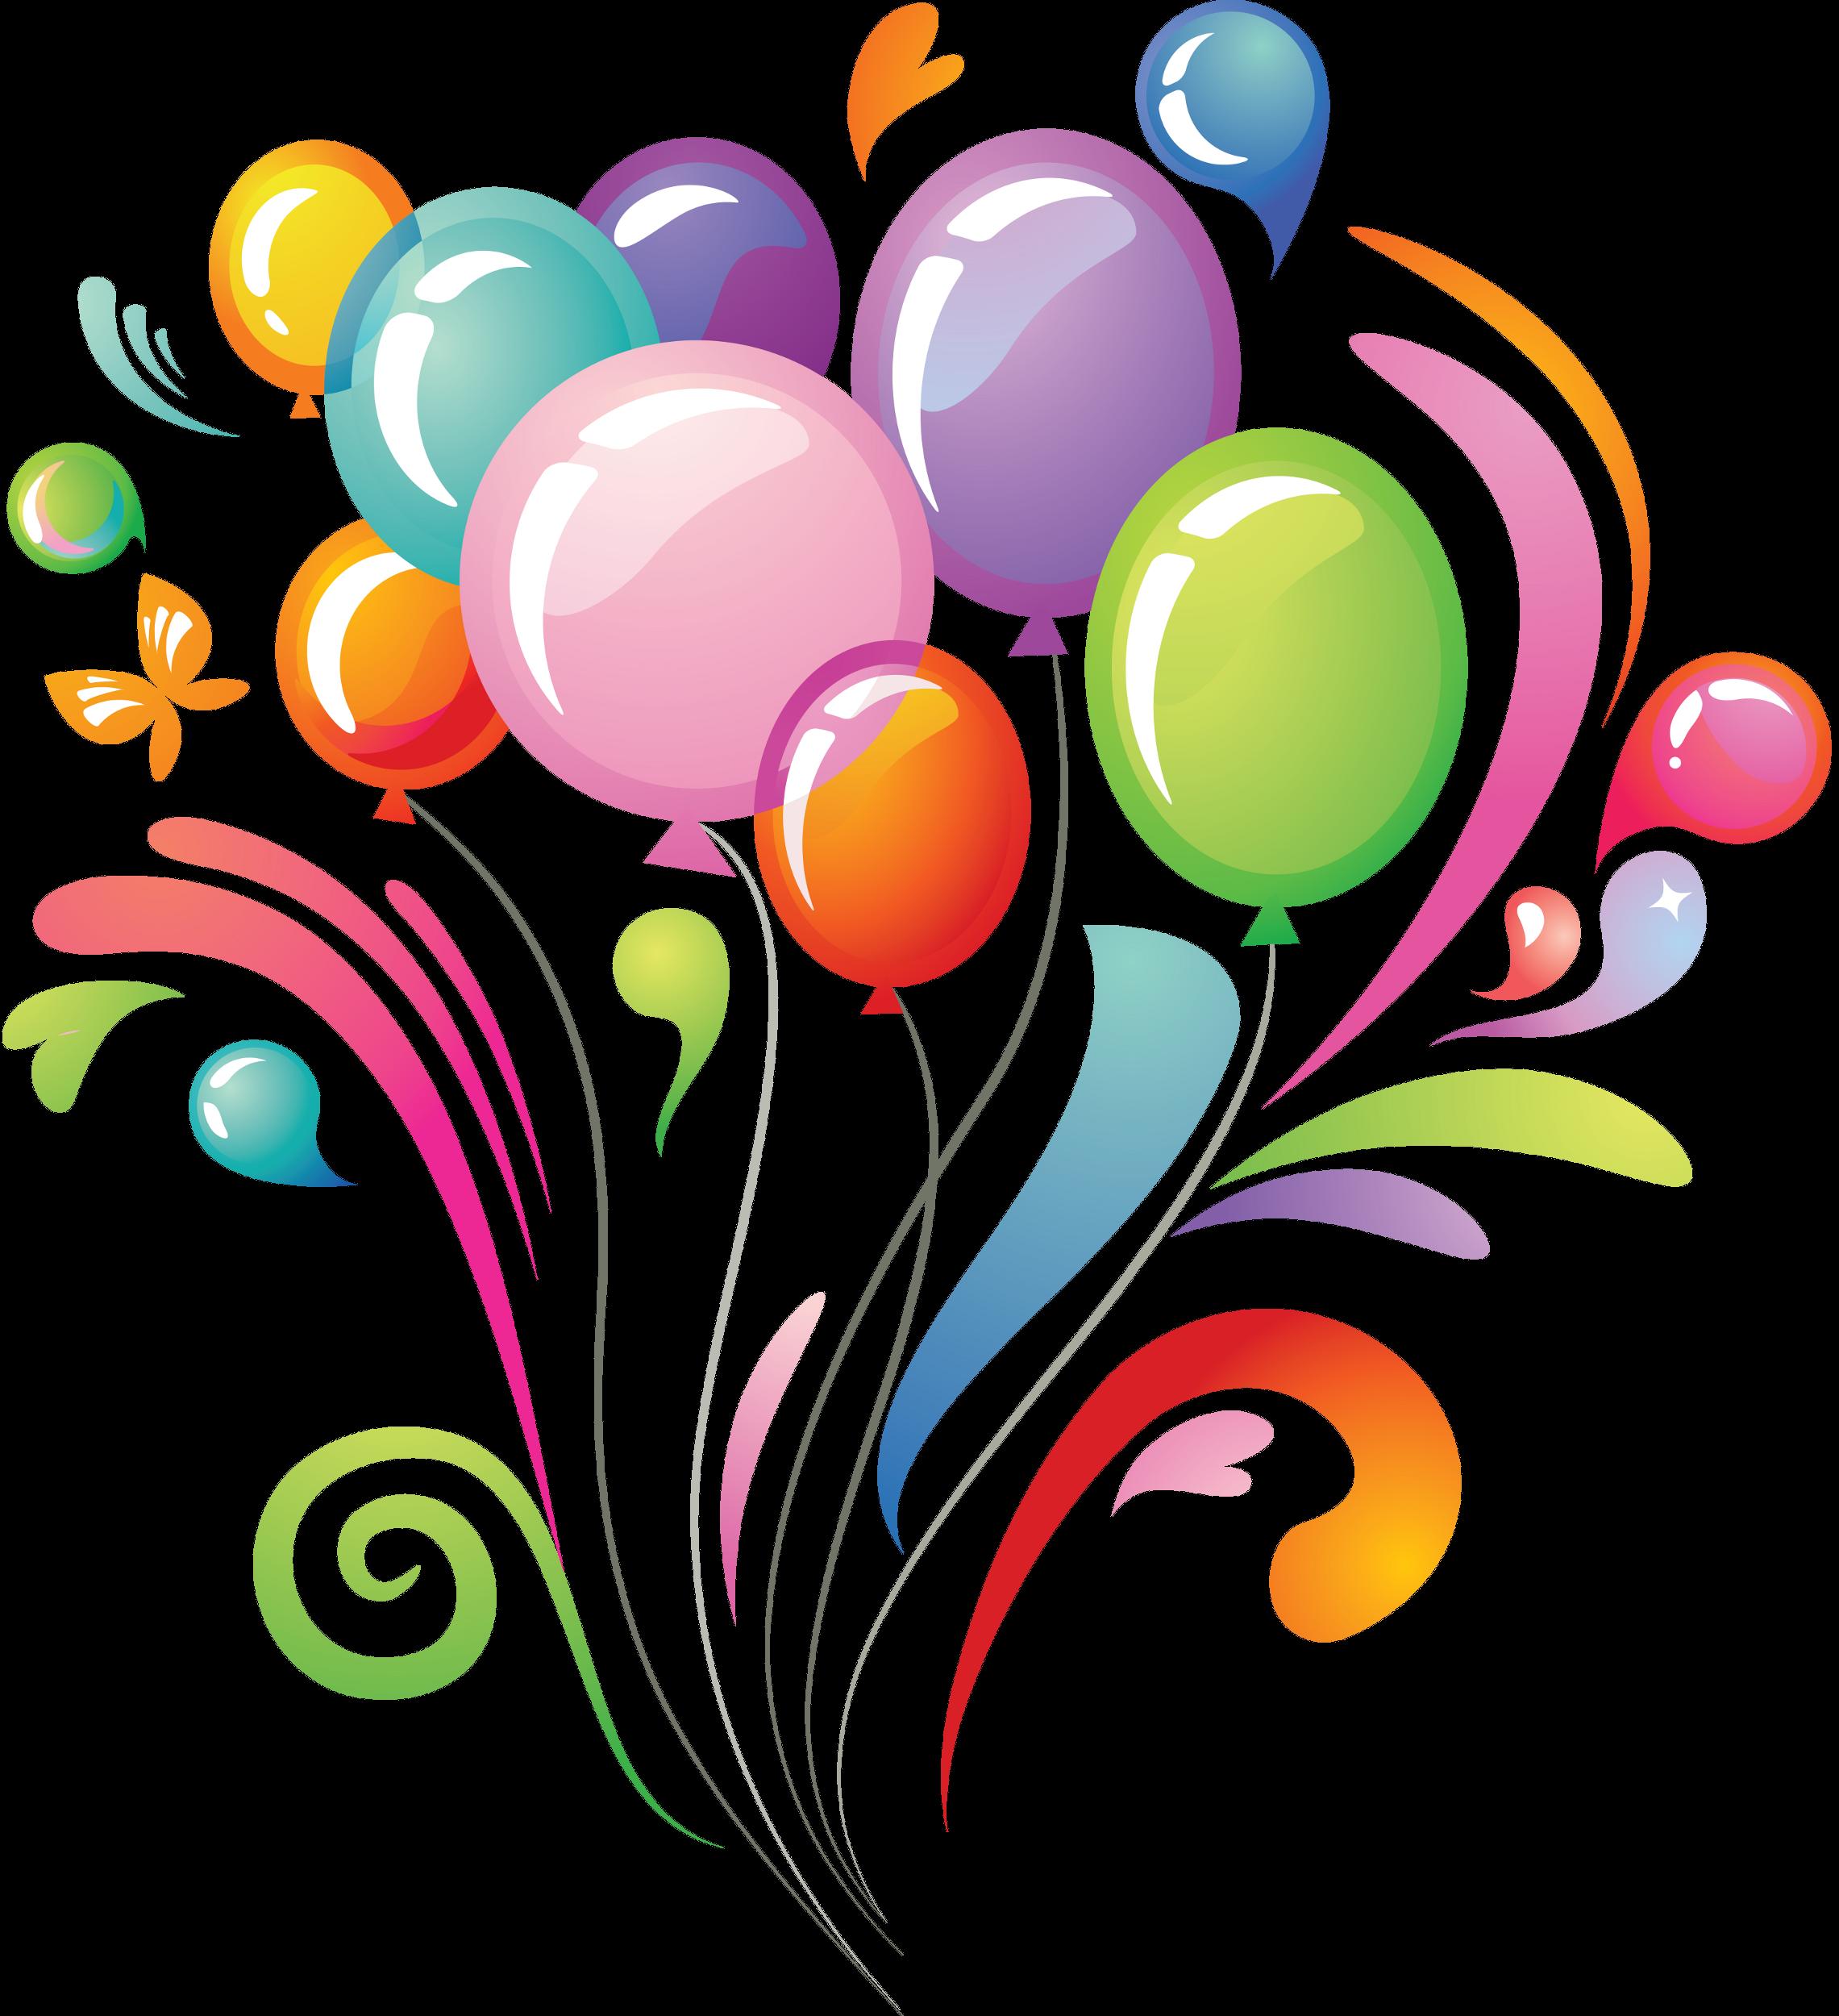 Papillon clipart summer Ballon Papillon Multicolores Multicolore Render